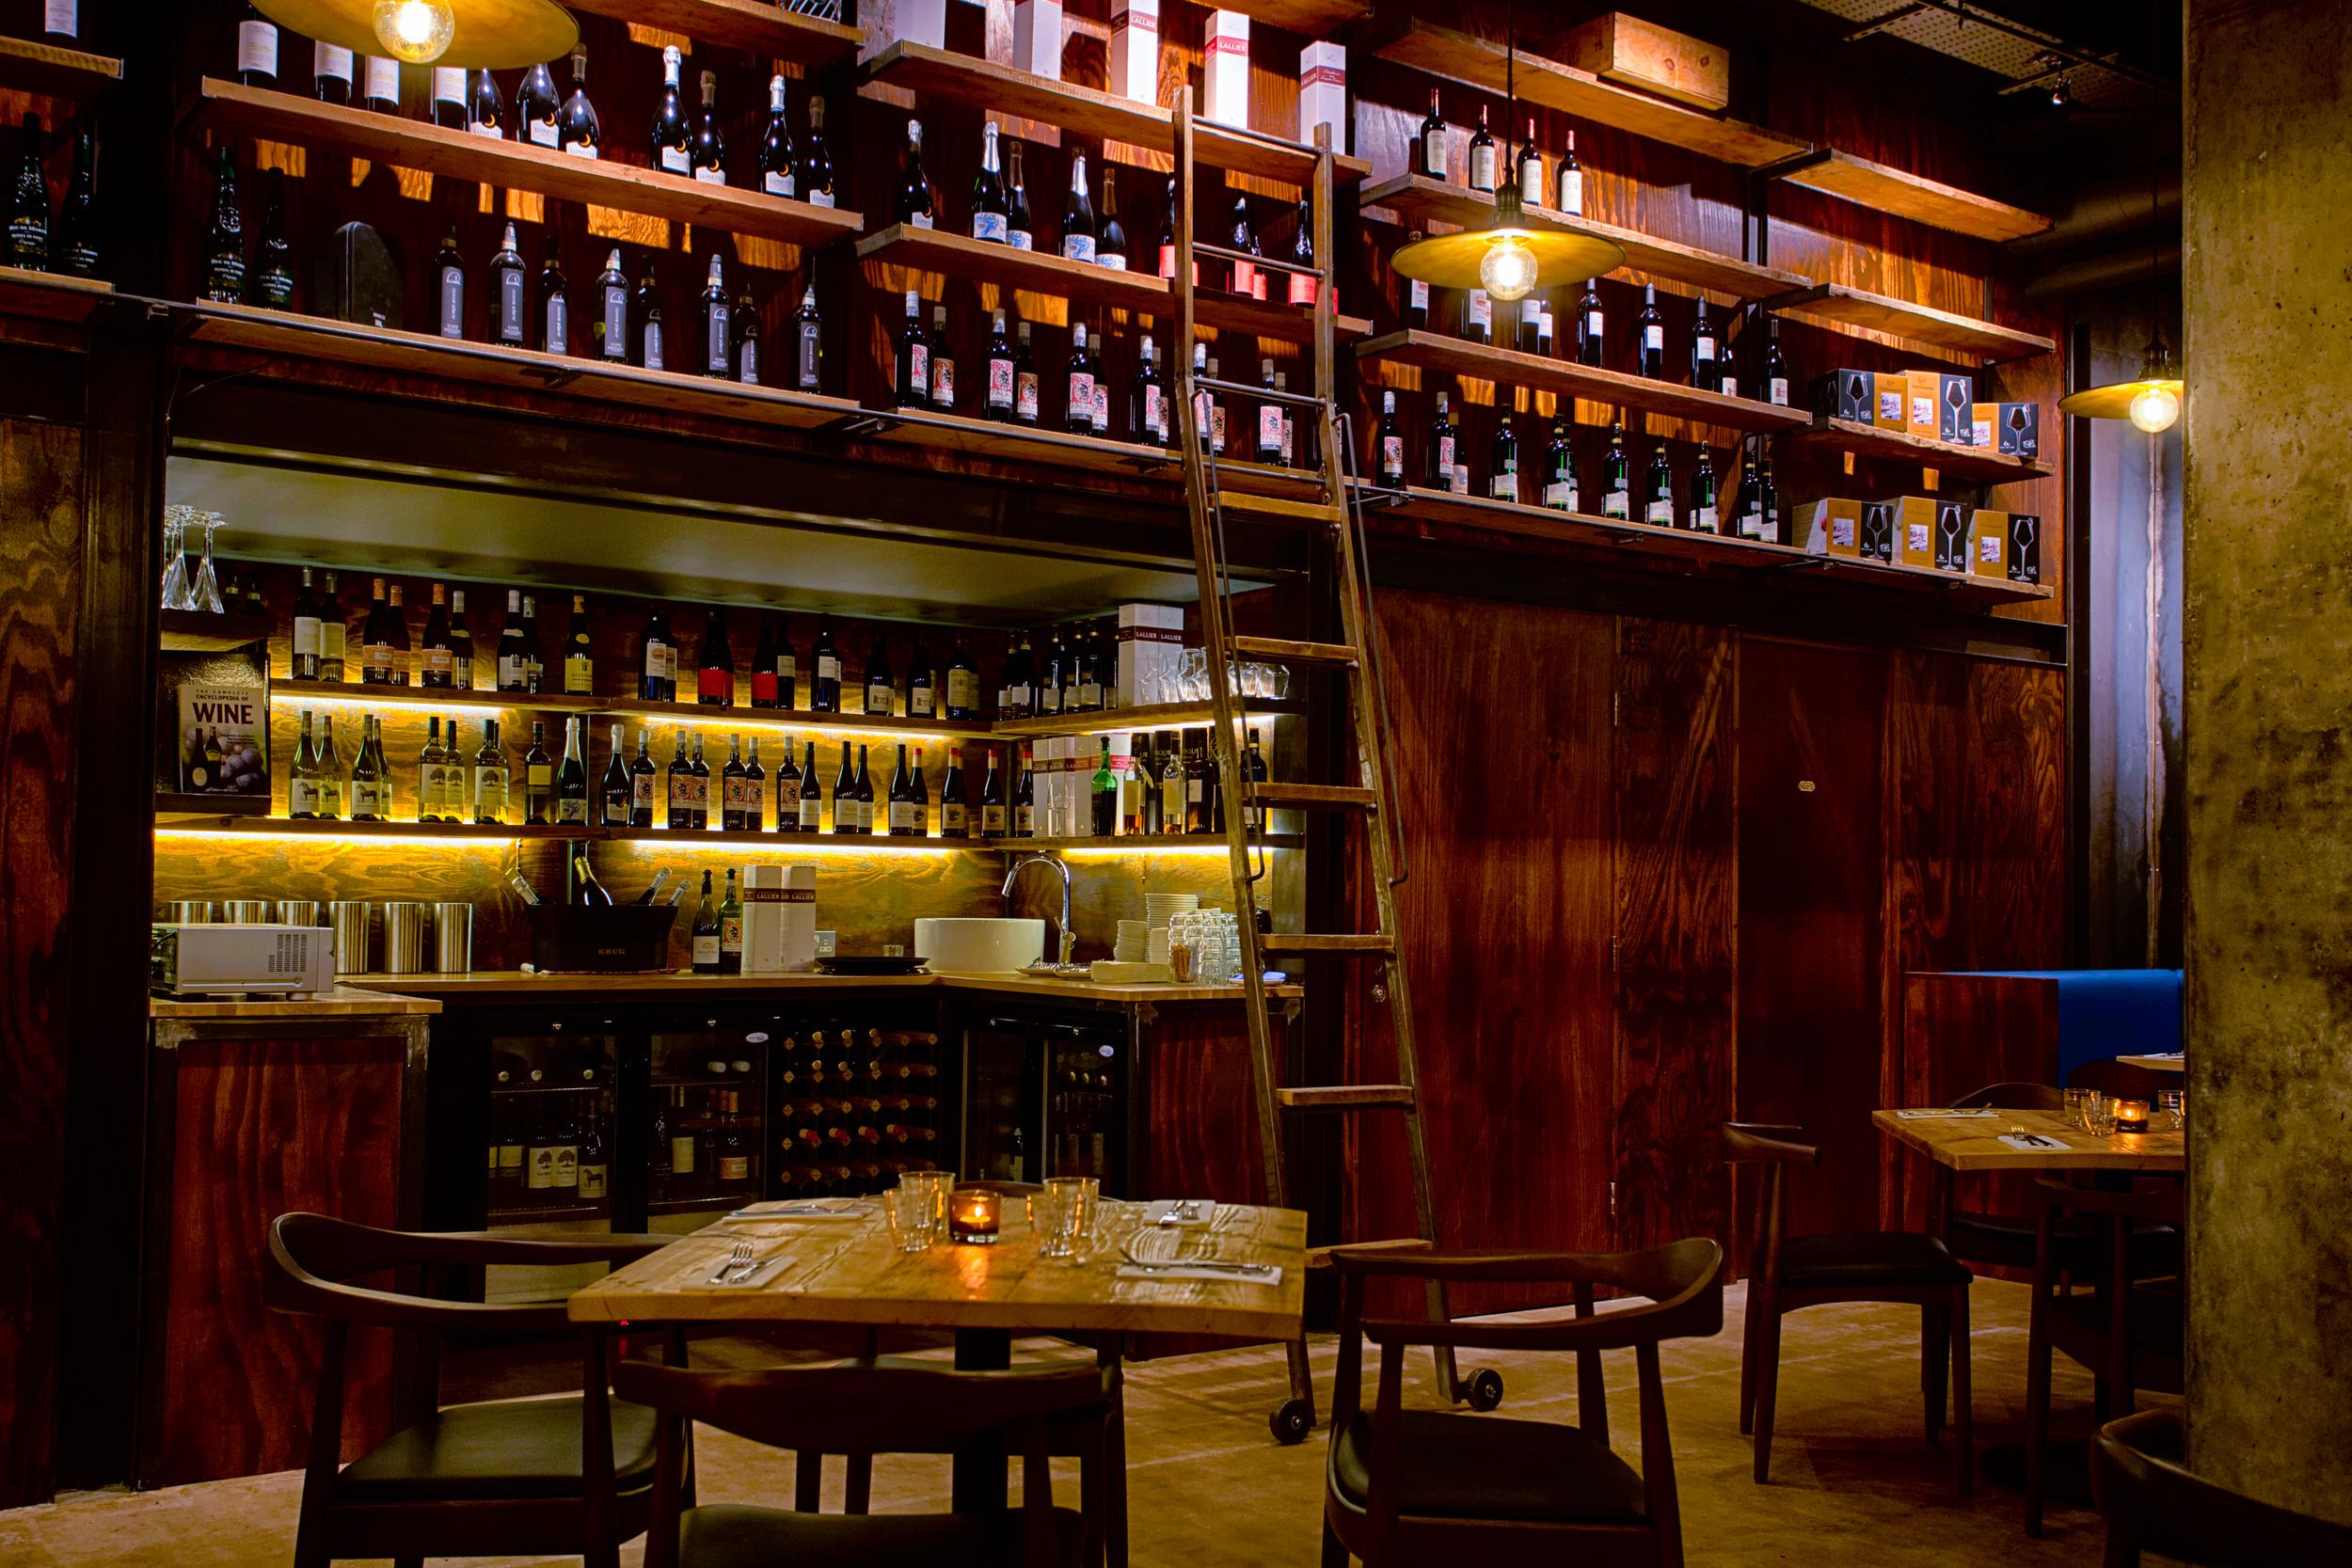 Darkhorse Restaurant_MG_3767_HDR_5.jpg